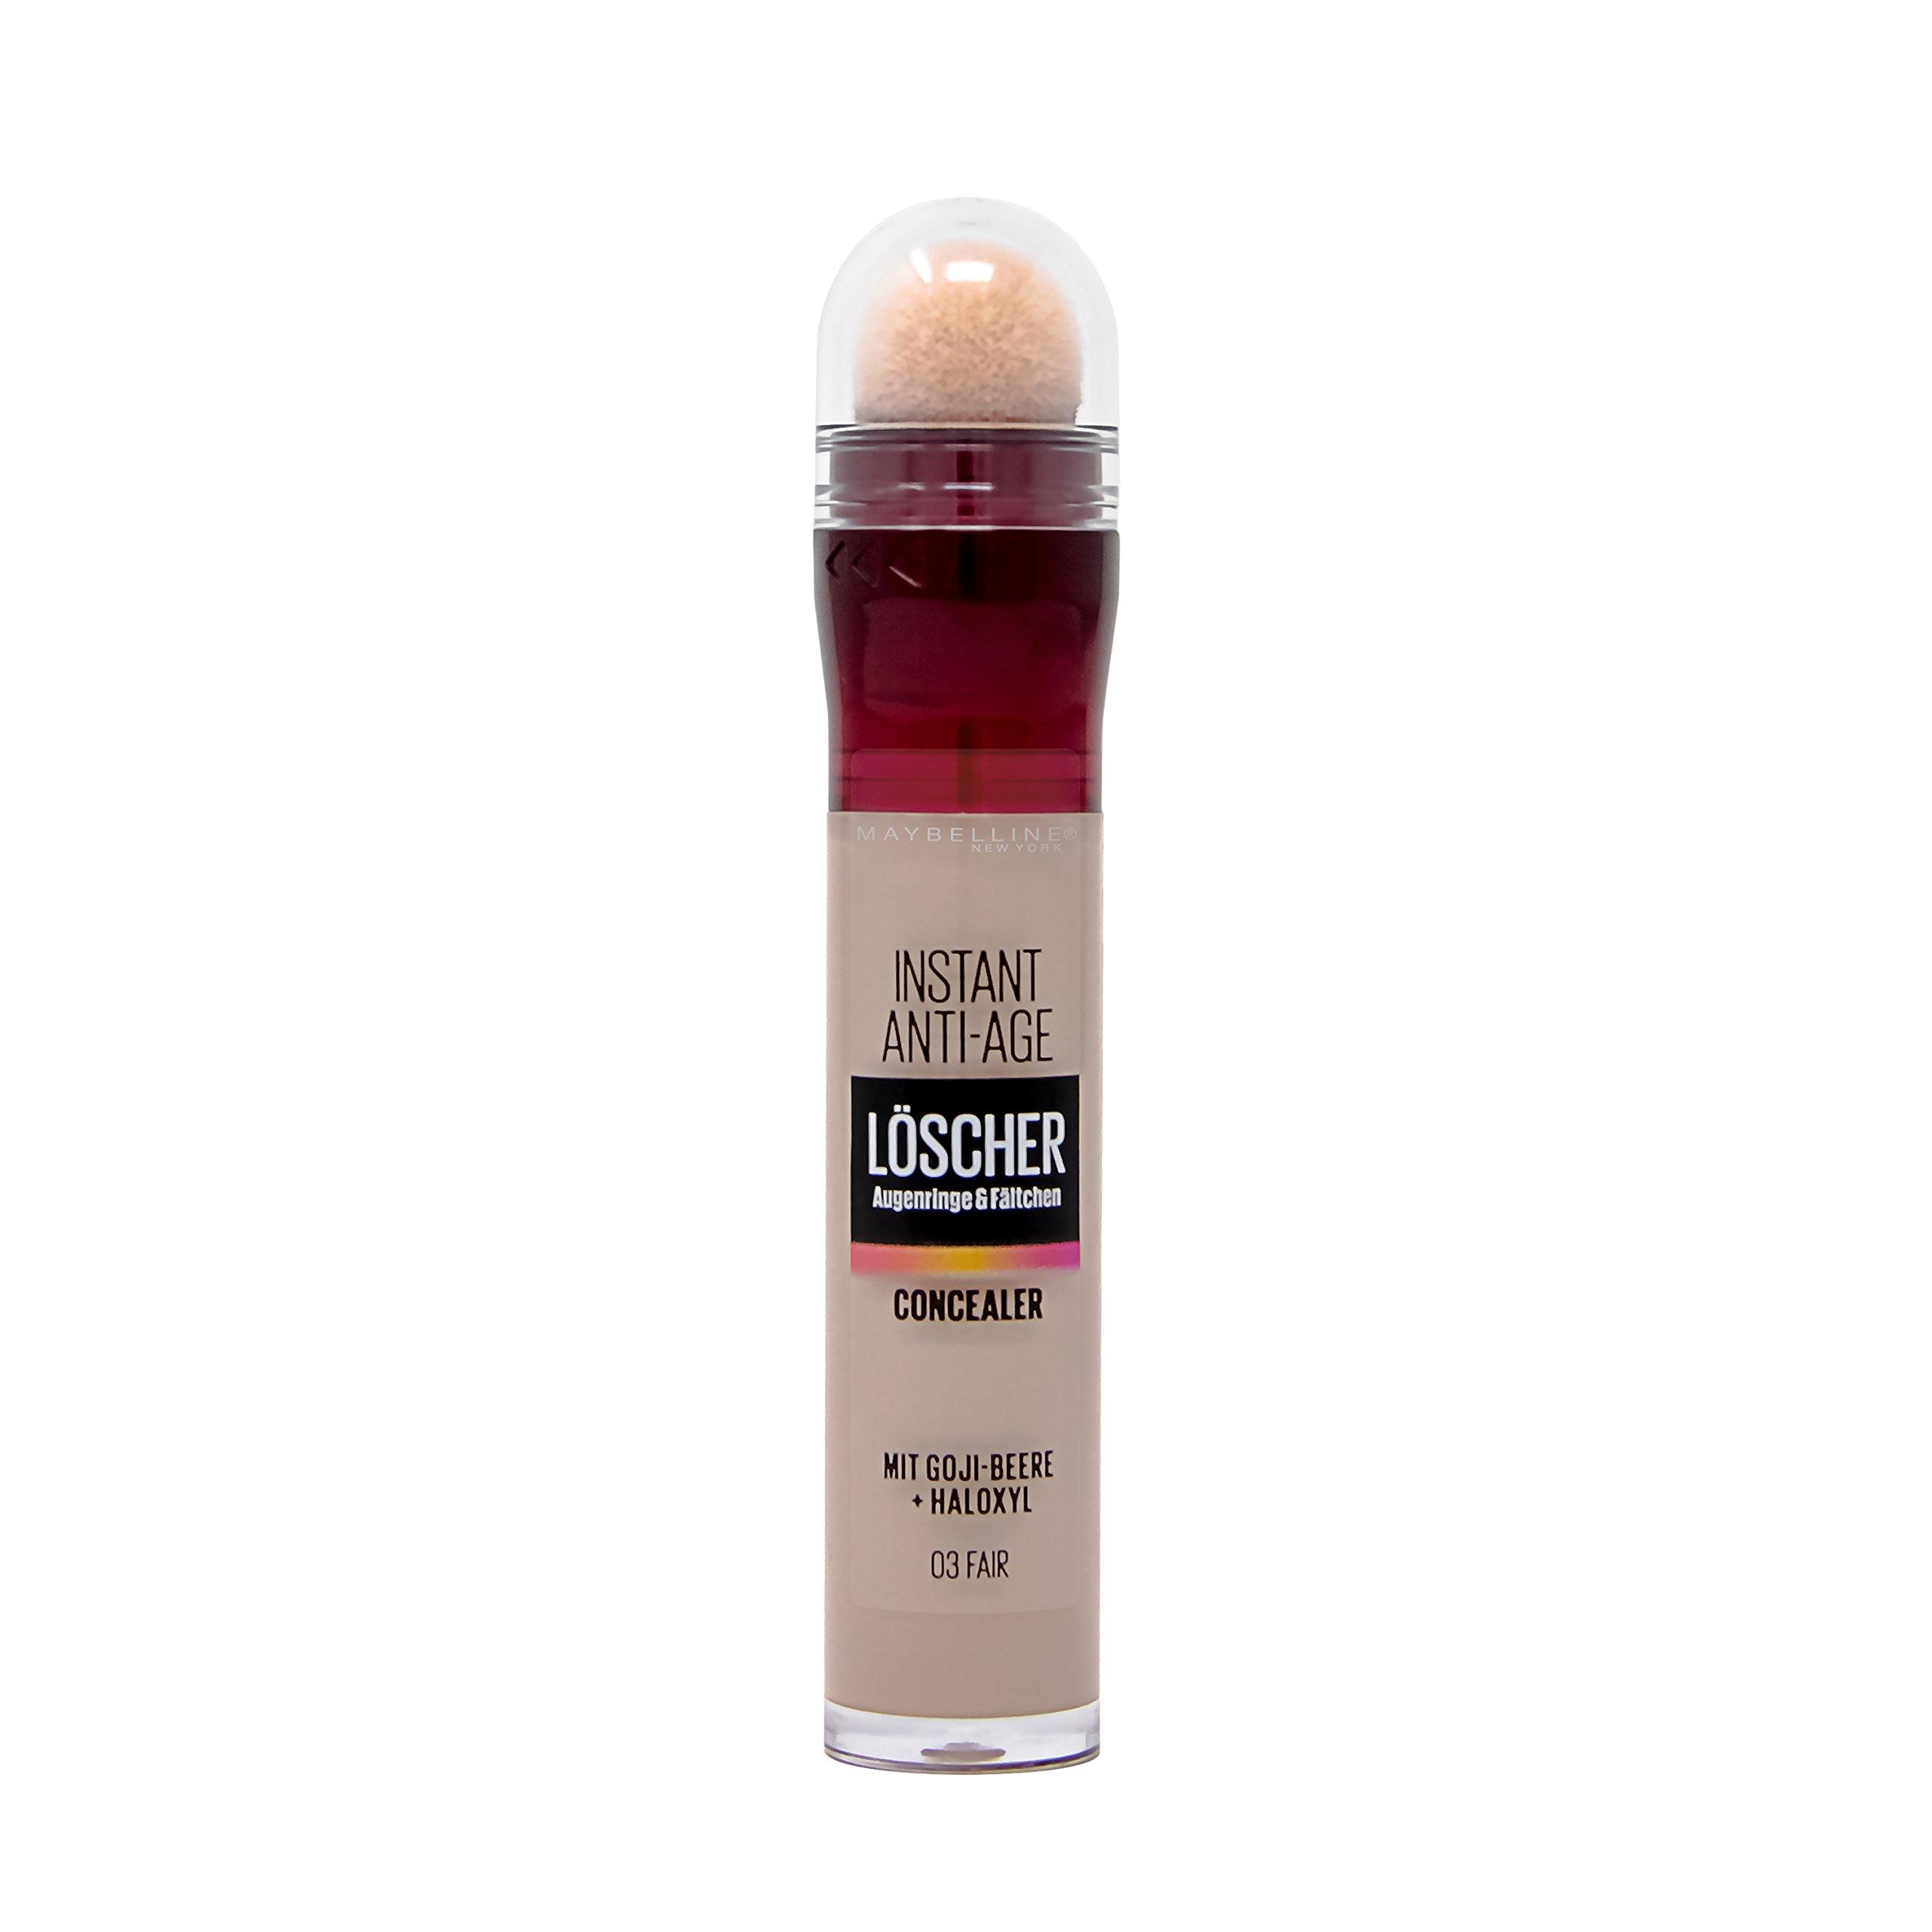 Maybelline New York Instant Anti-Age Effekt Concealer, 03 Fair, 1er Pack (1 x 6,8 ml) product image